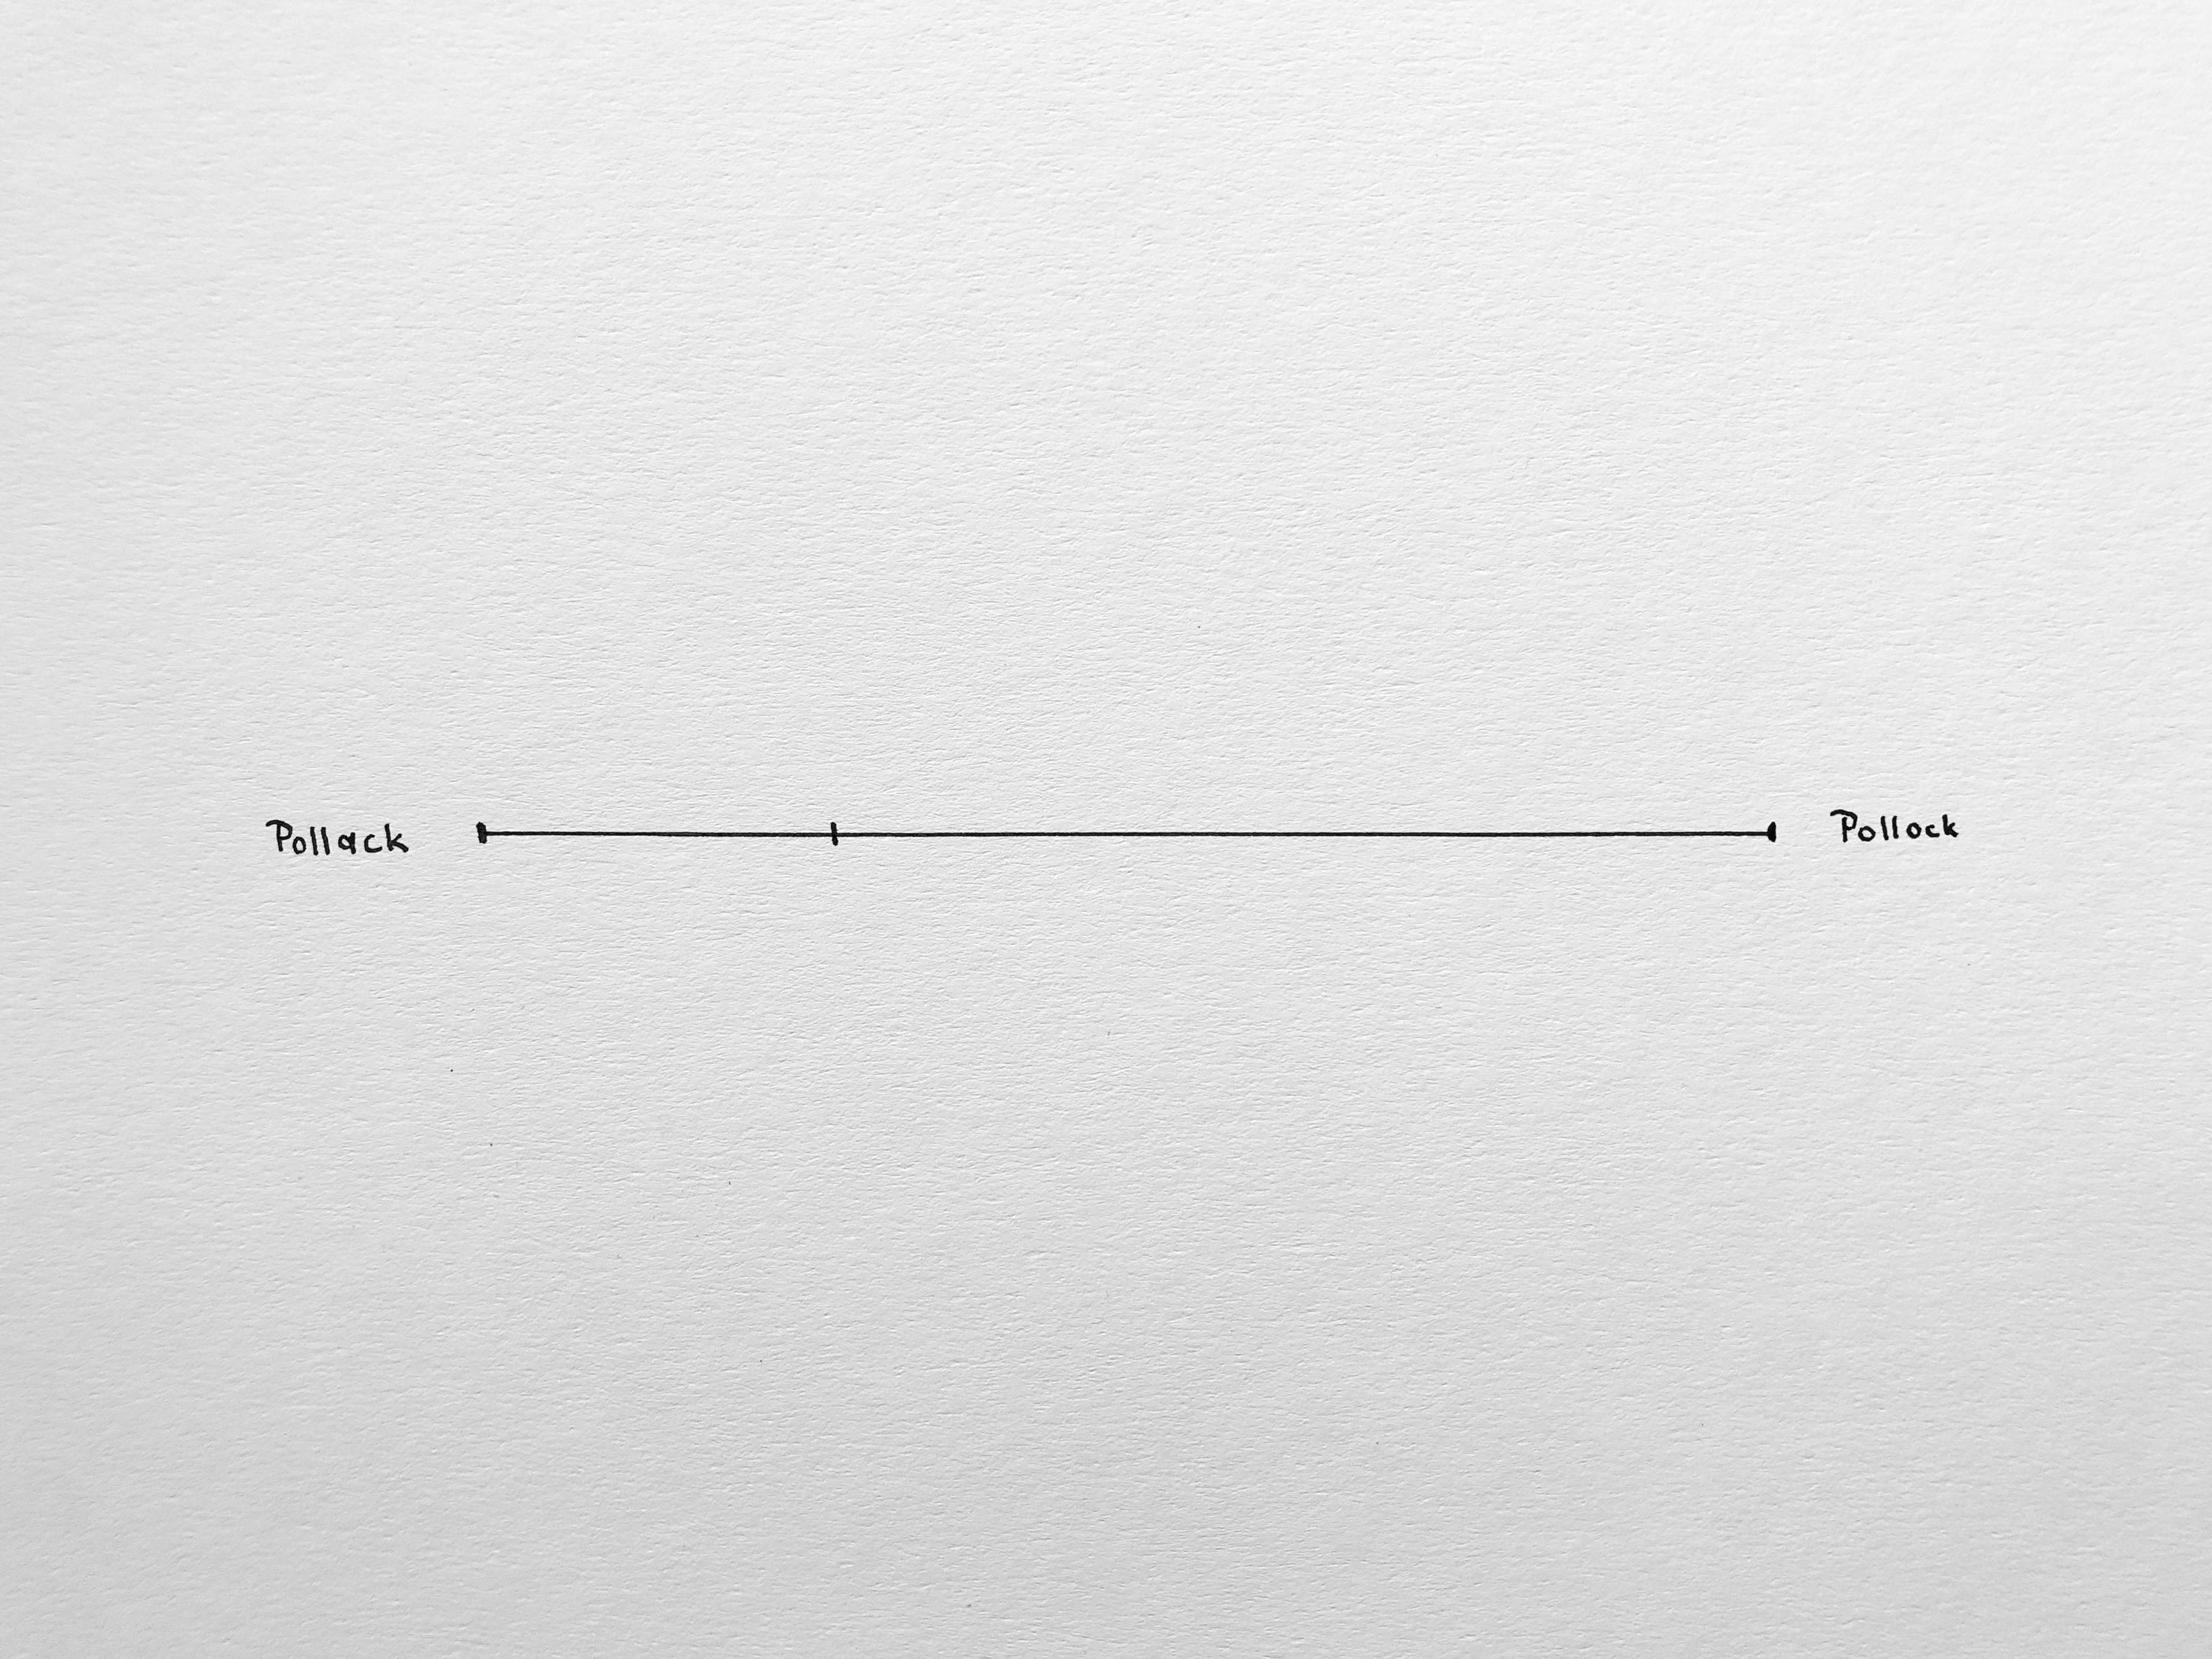 Odd Parameters: Pollack-Pollock, Pen on Paper, 32x24cm, 2018